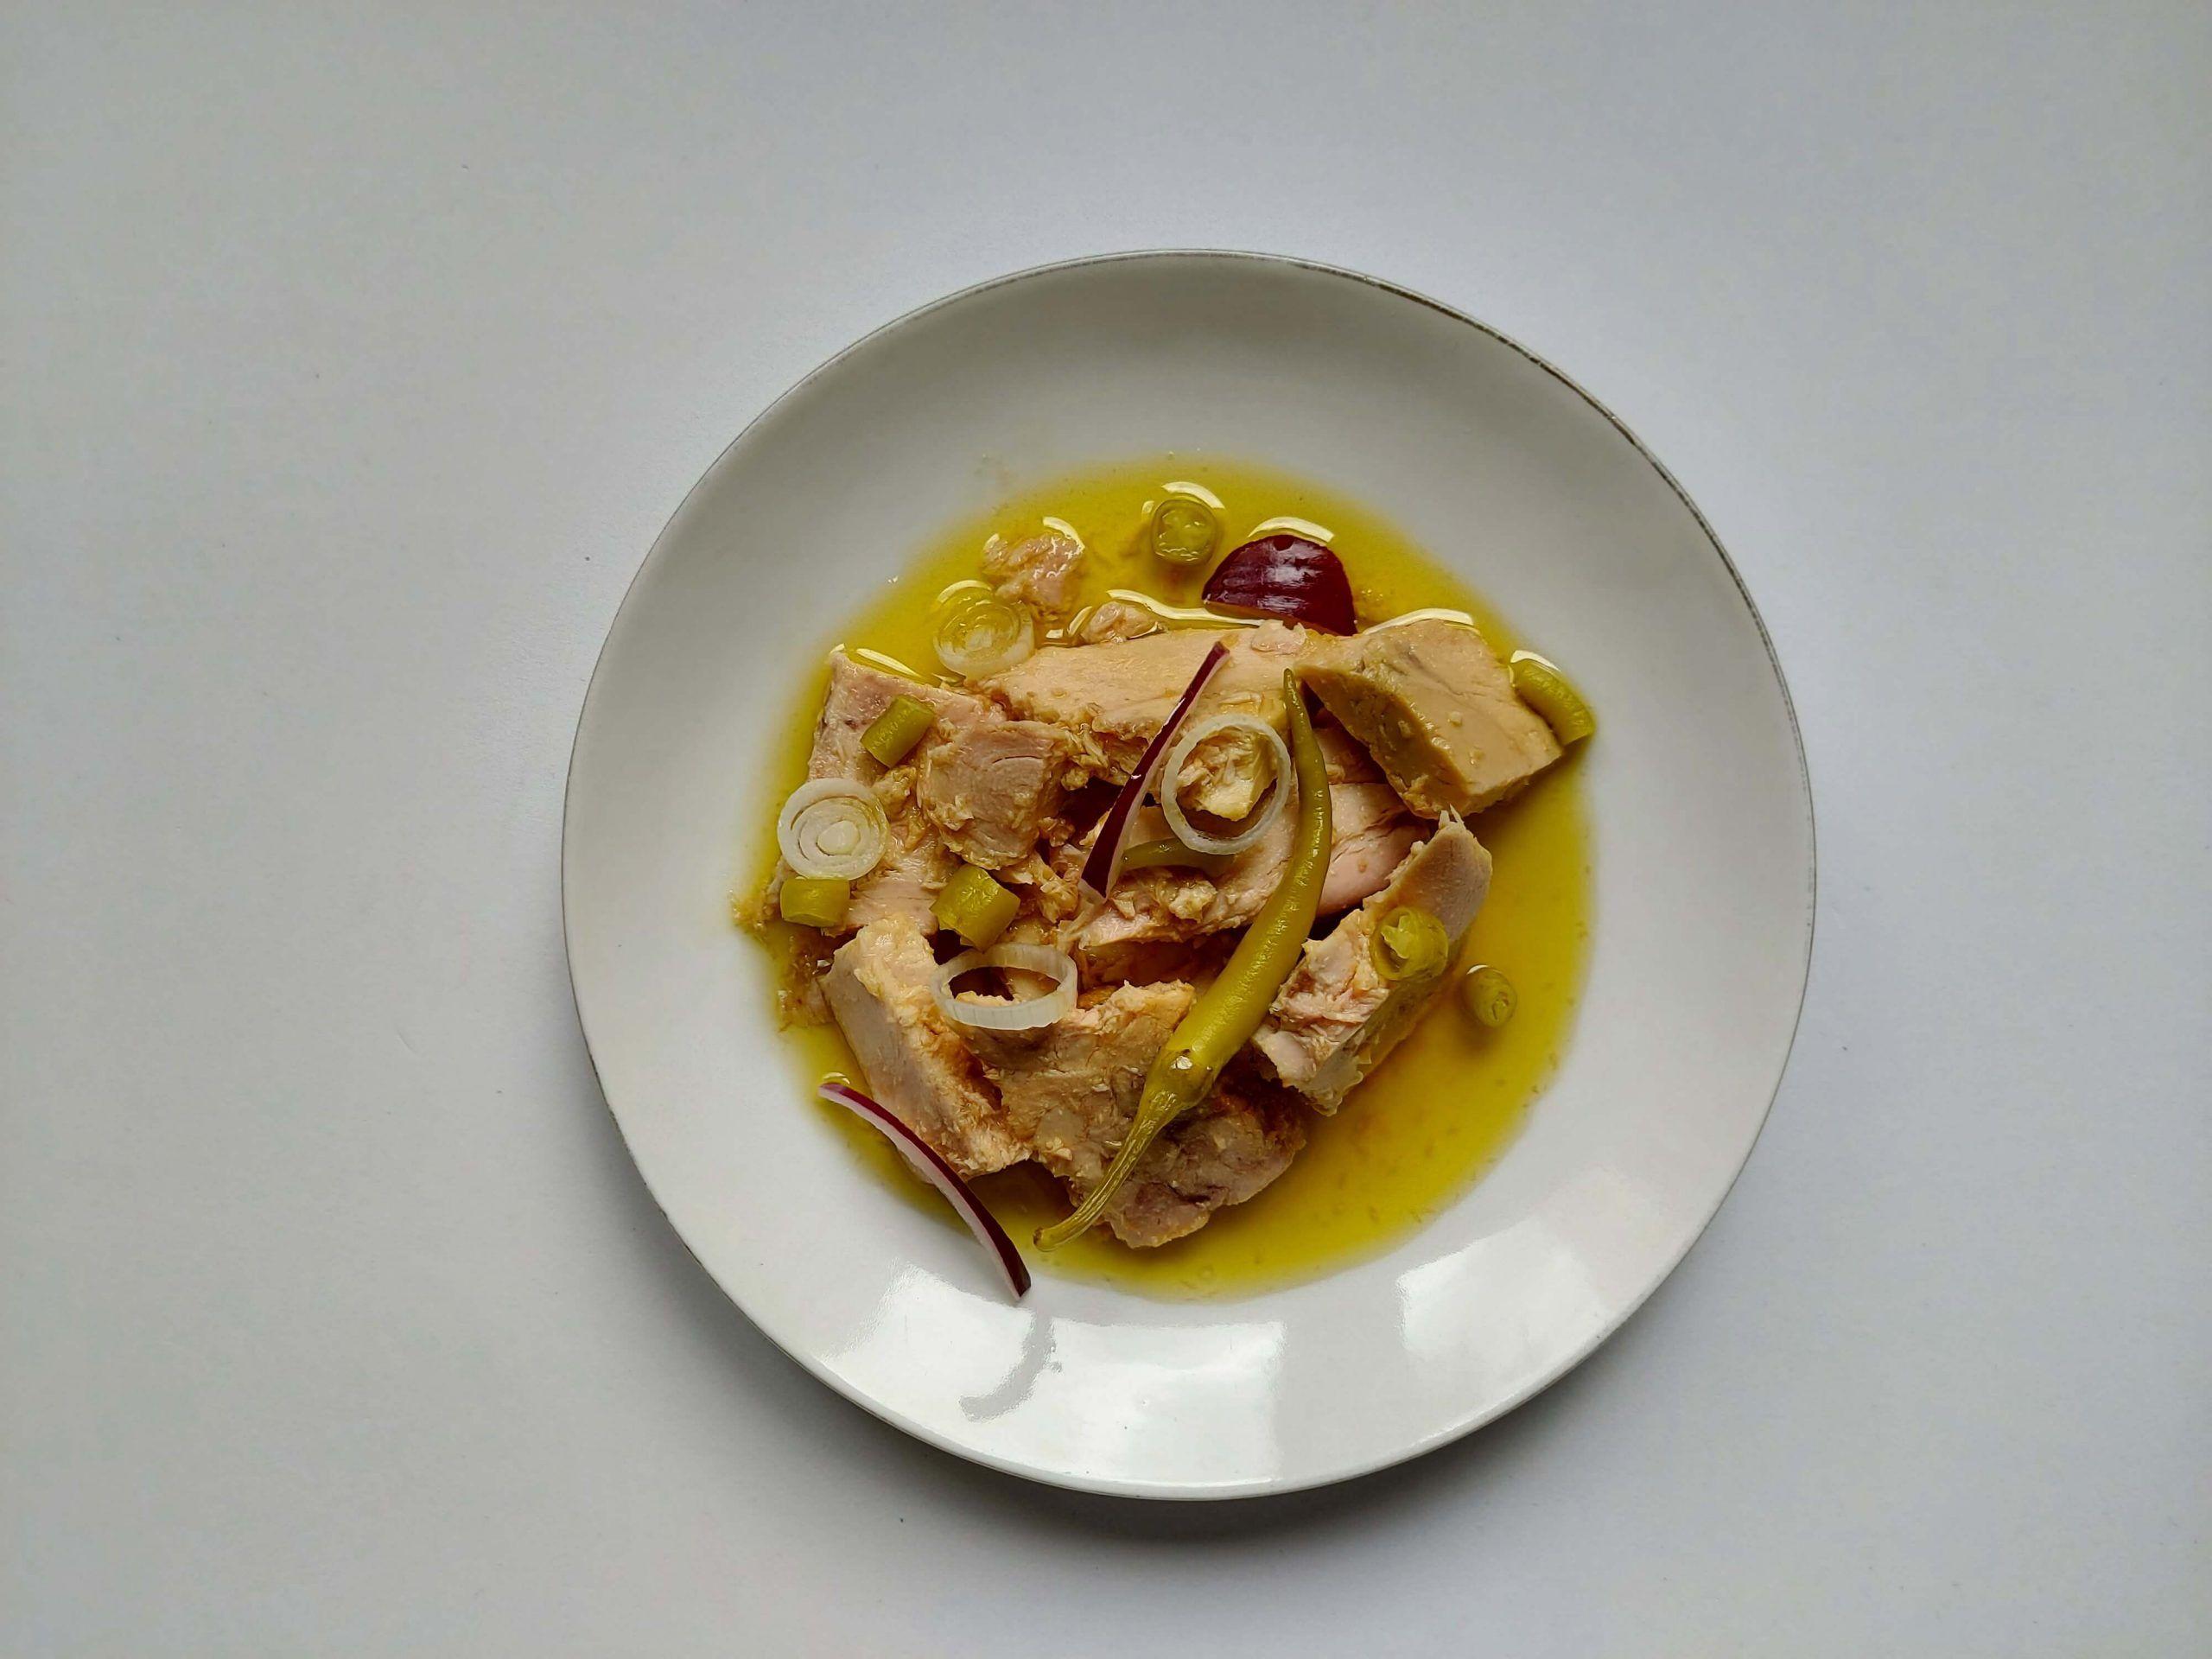 Organic white tuna in olive oil Arlequin 400 g.